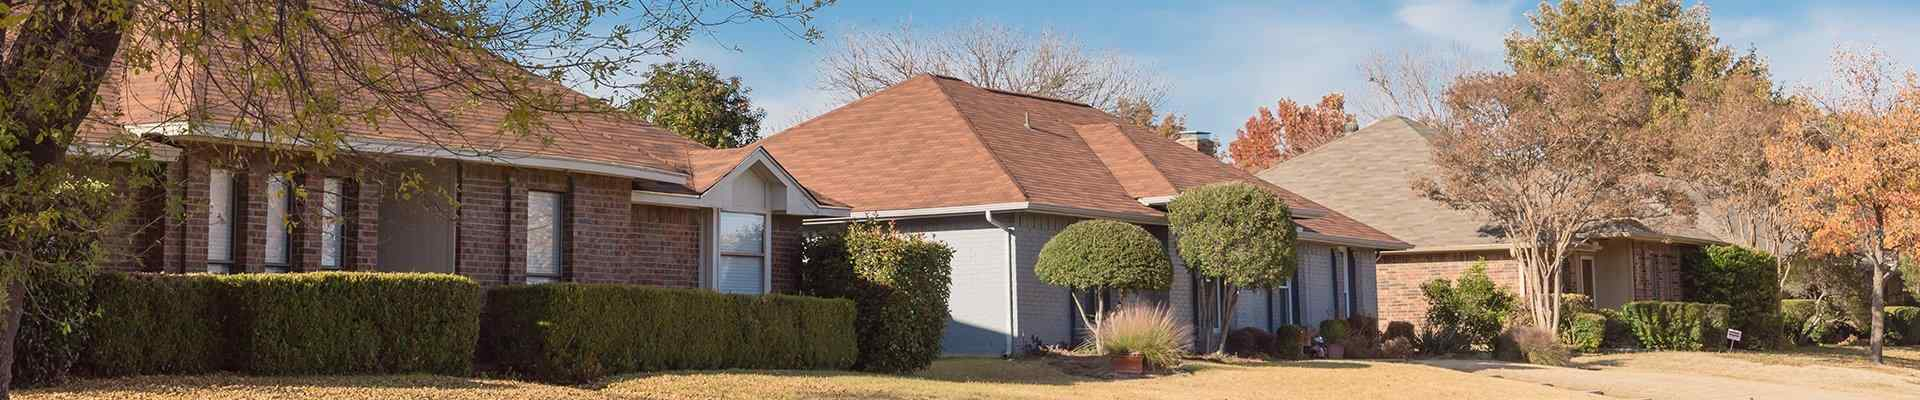 a row of homes in a suburban neighborhood in argyle texas